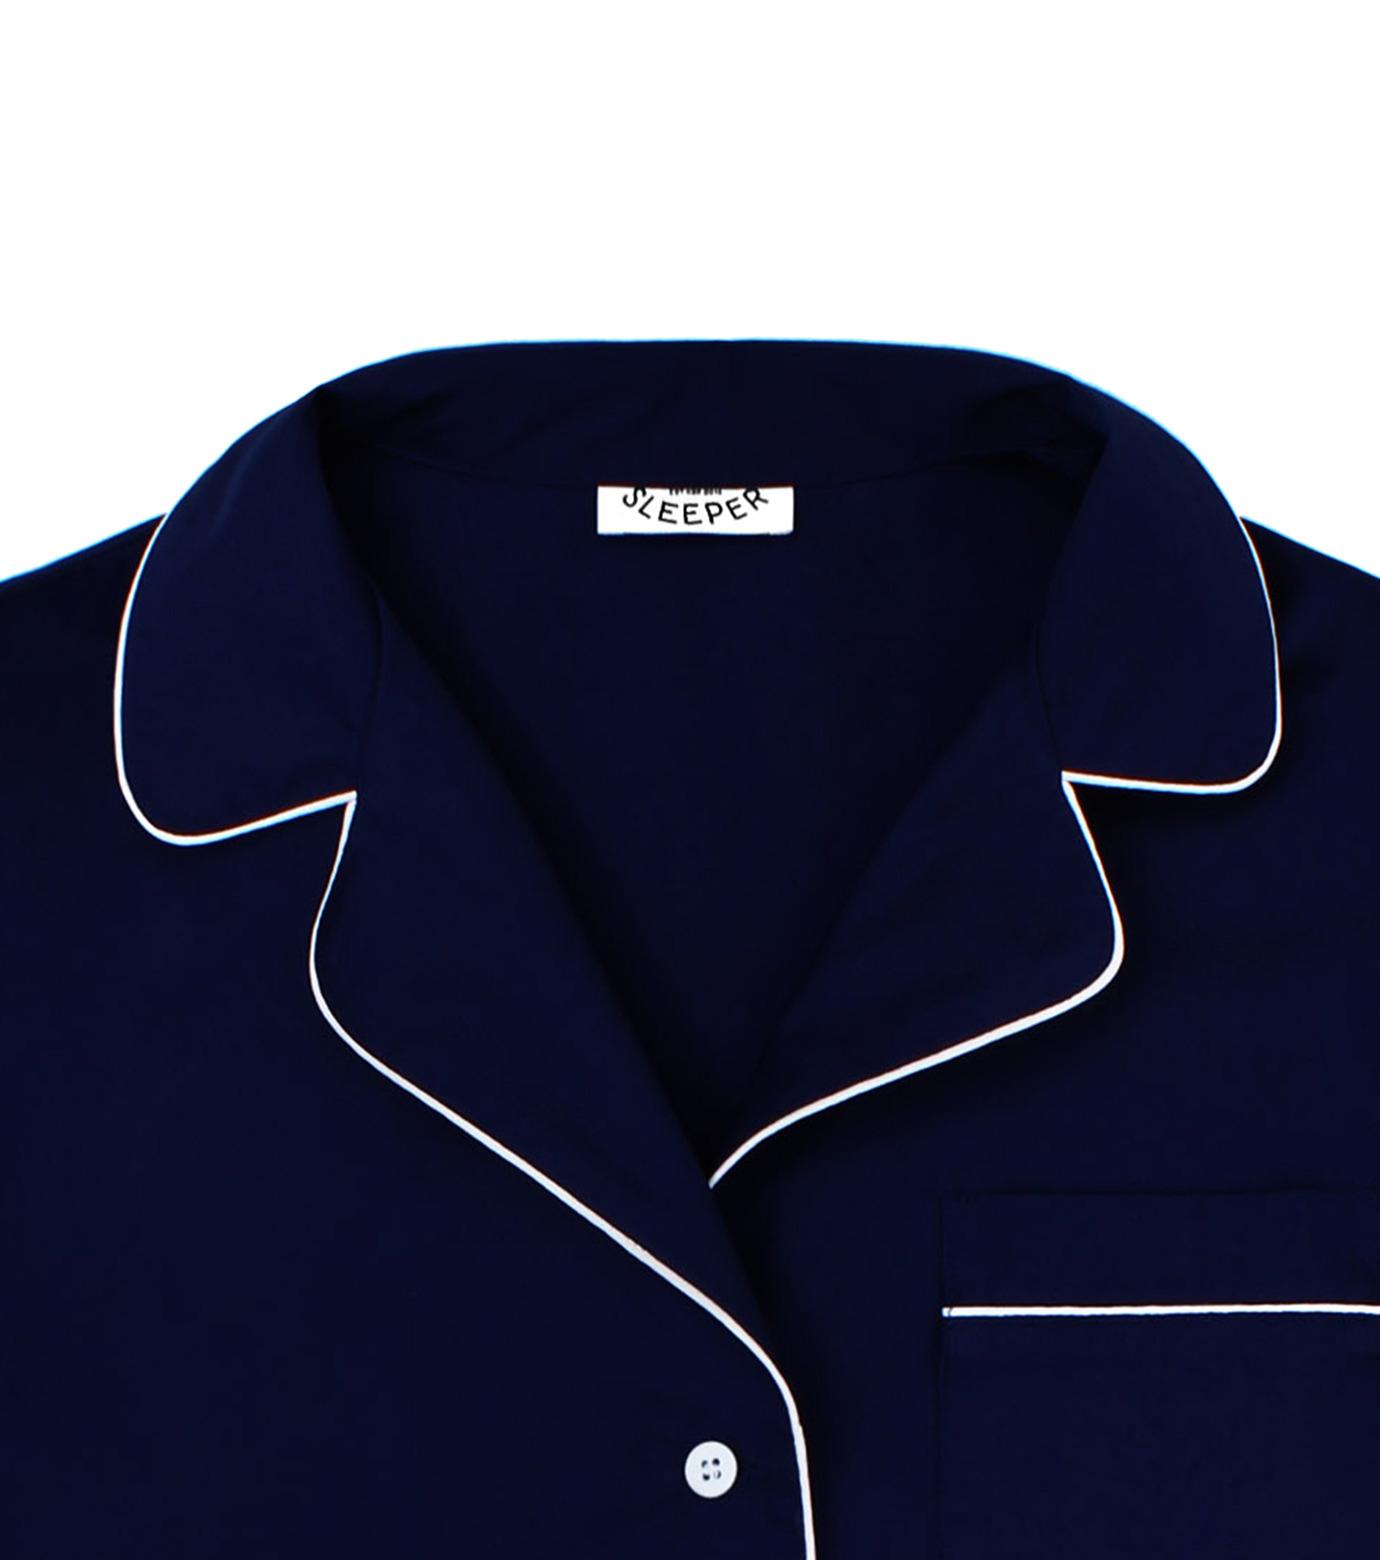 SLEEPER(スリーパー)のRoyal Blue Pajama Set with Shorts-NAVY(LINGERIE/LINGERIE)-BC0045-93 拡大詳細画像2